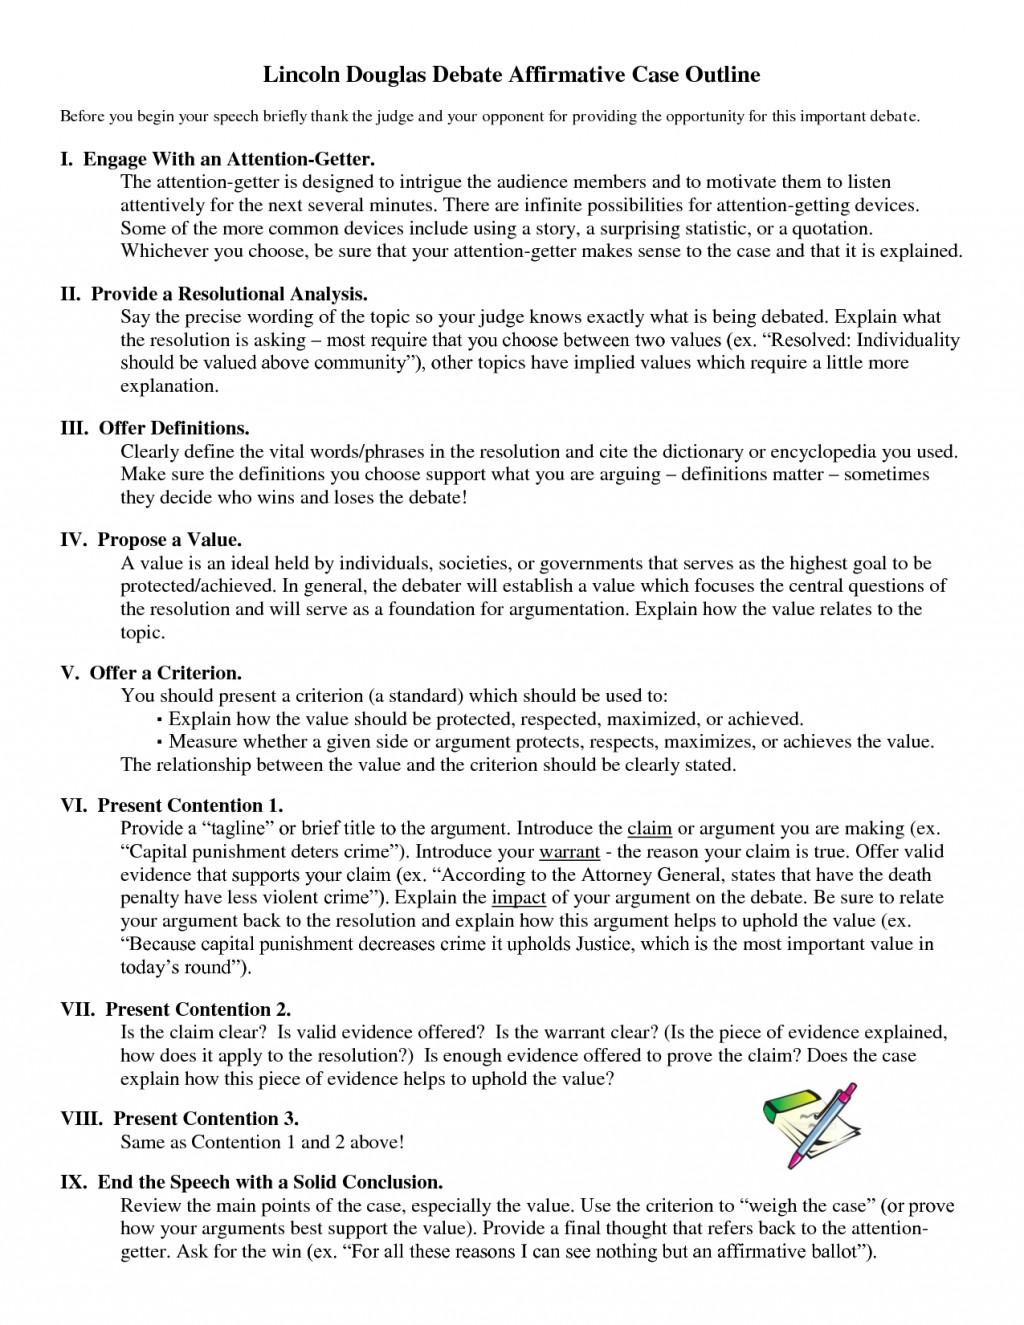 007 Debate Essay Topics Example Lincoln Douglas Affirmative Marvelous Interesting Persuasive Questions Large